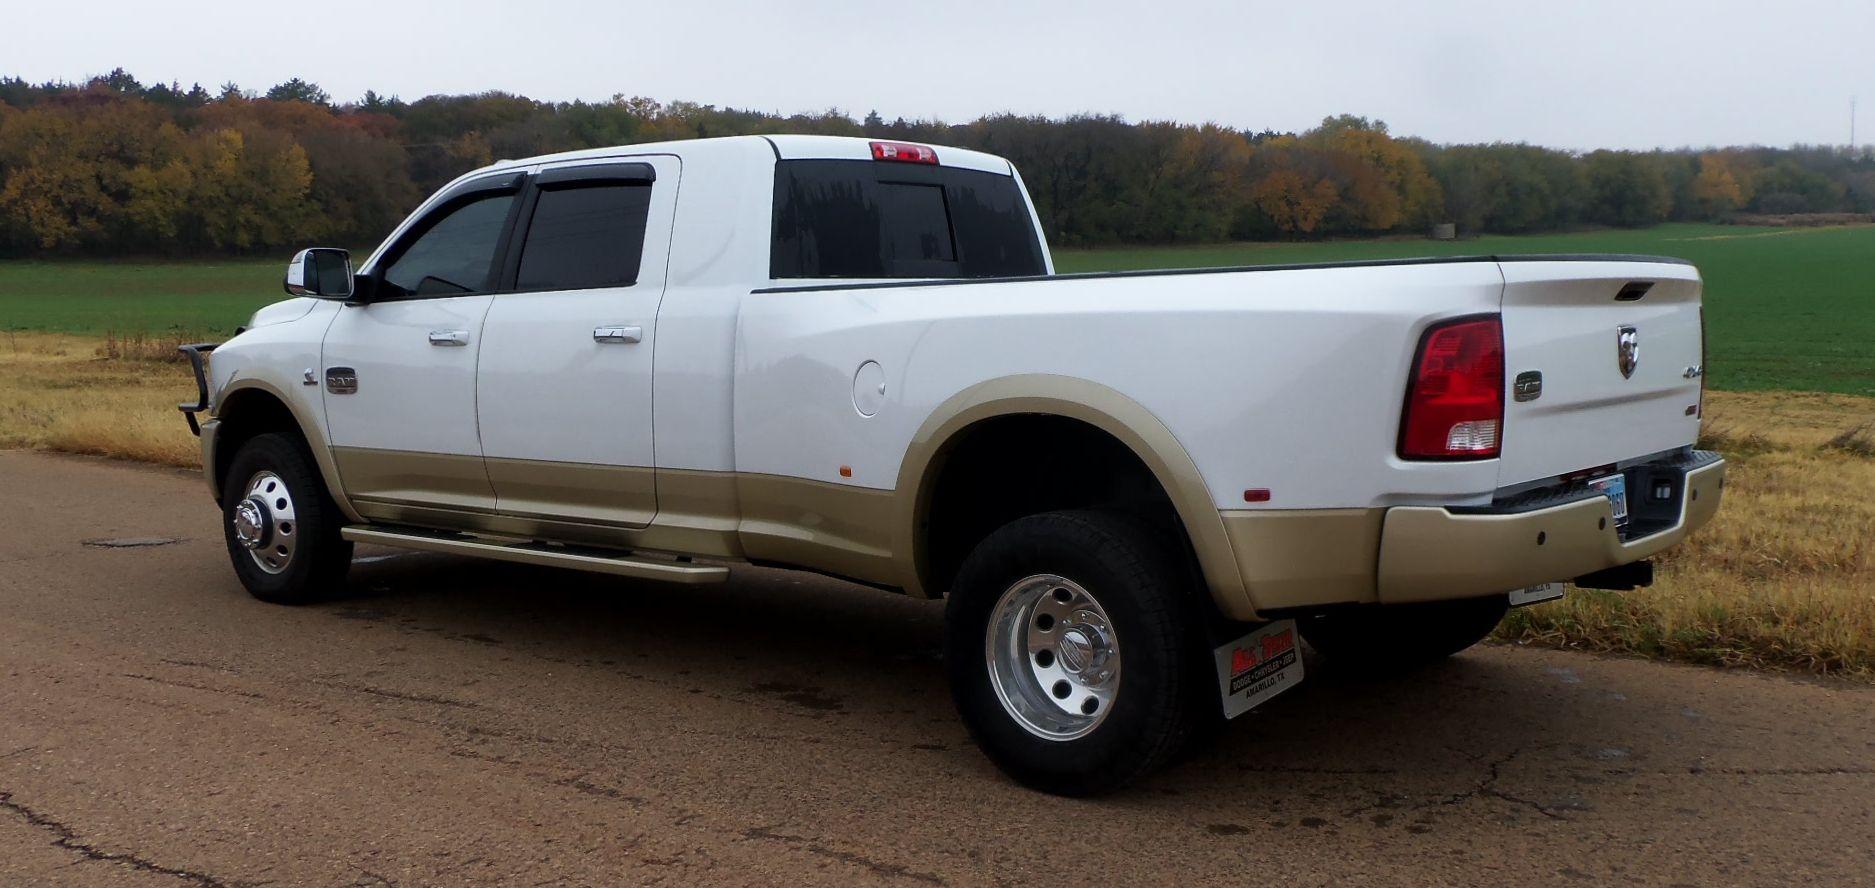 2013 dually dodge mega cab long bed dodge ram 3500ram truck html autos weblog. Black Bedroom Furniture Sets. Home Design Ideas